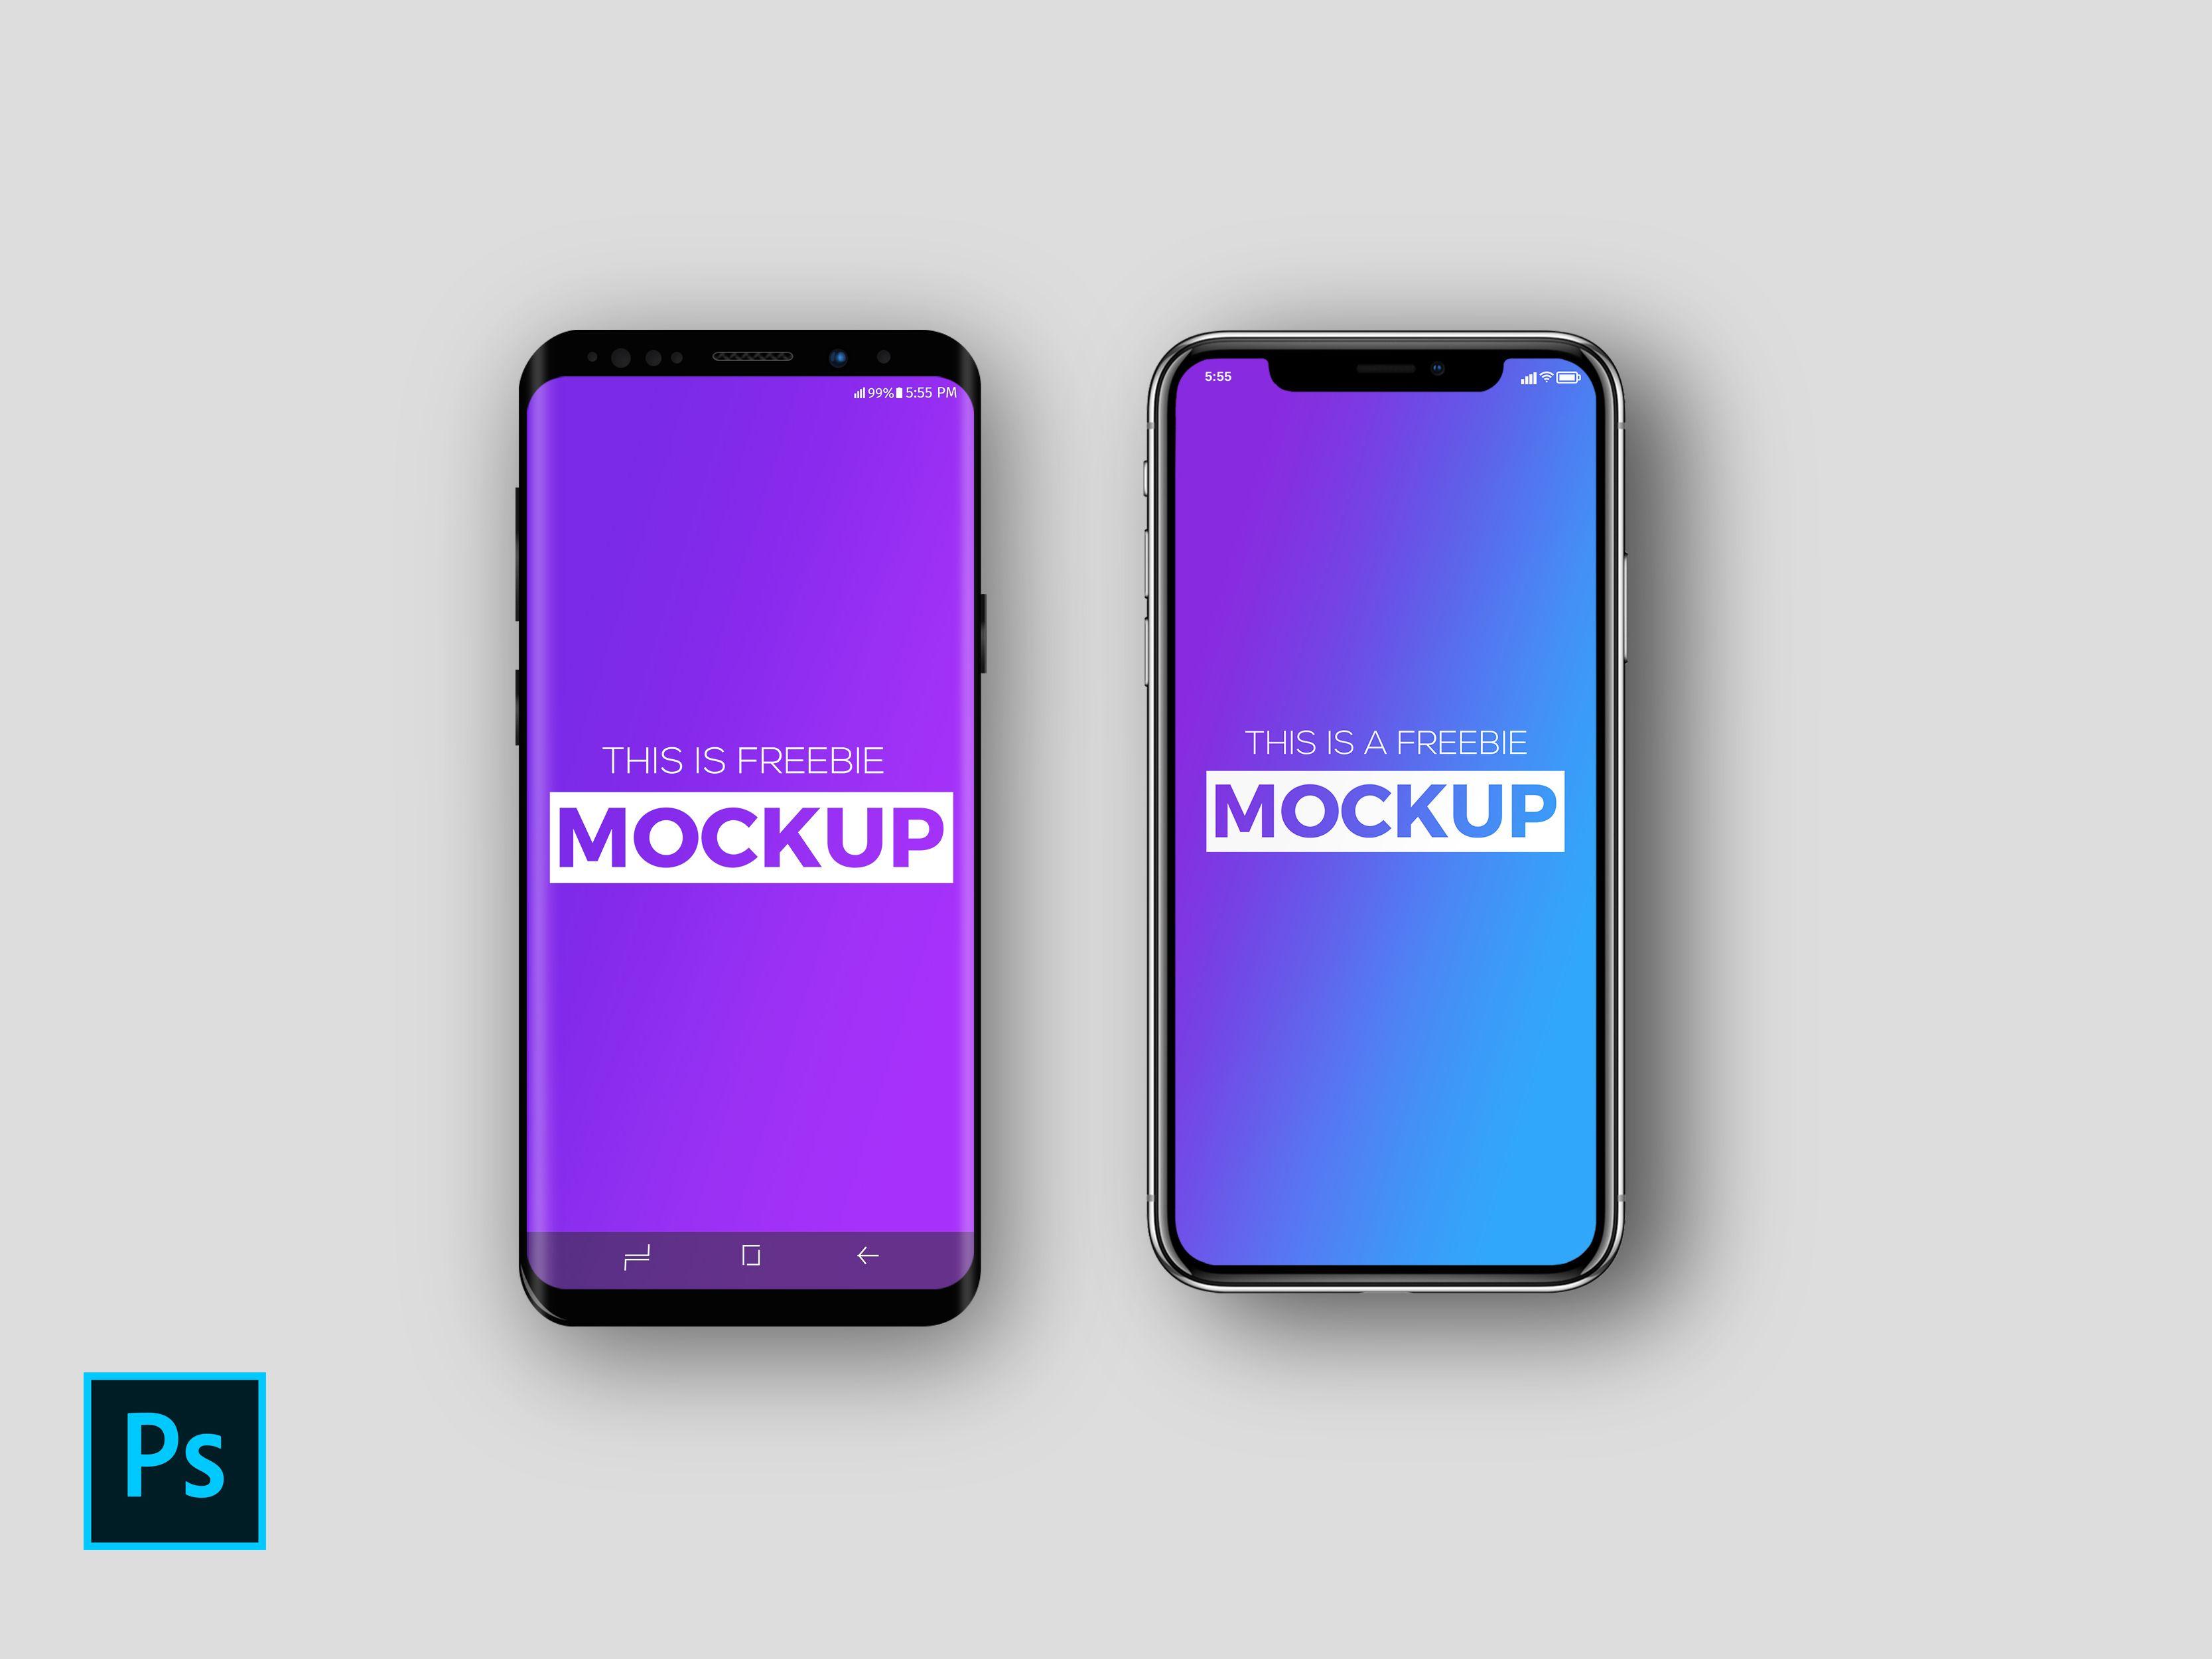 Iphone x max mockup